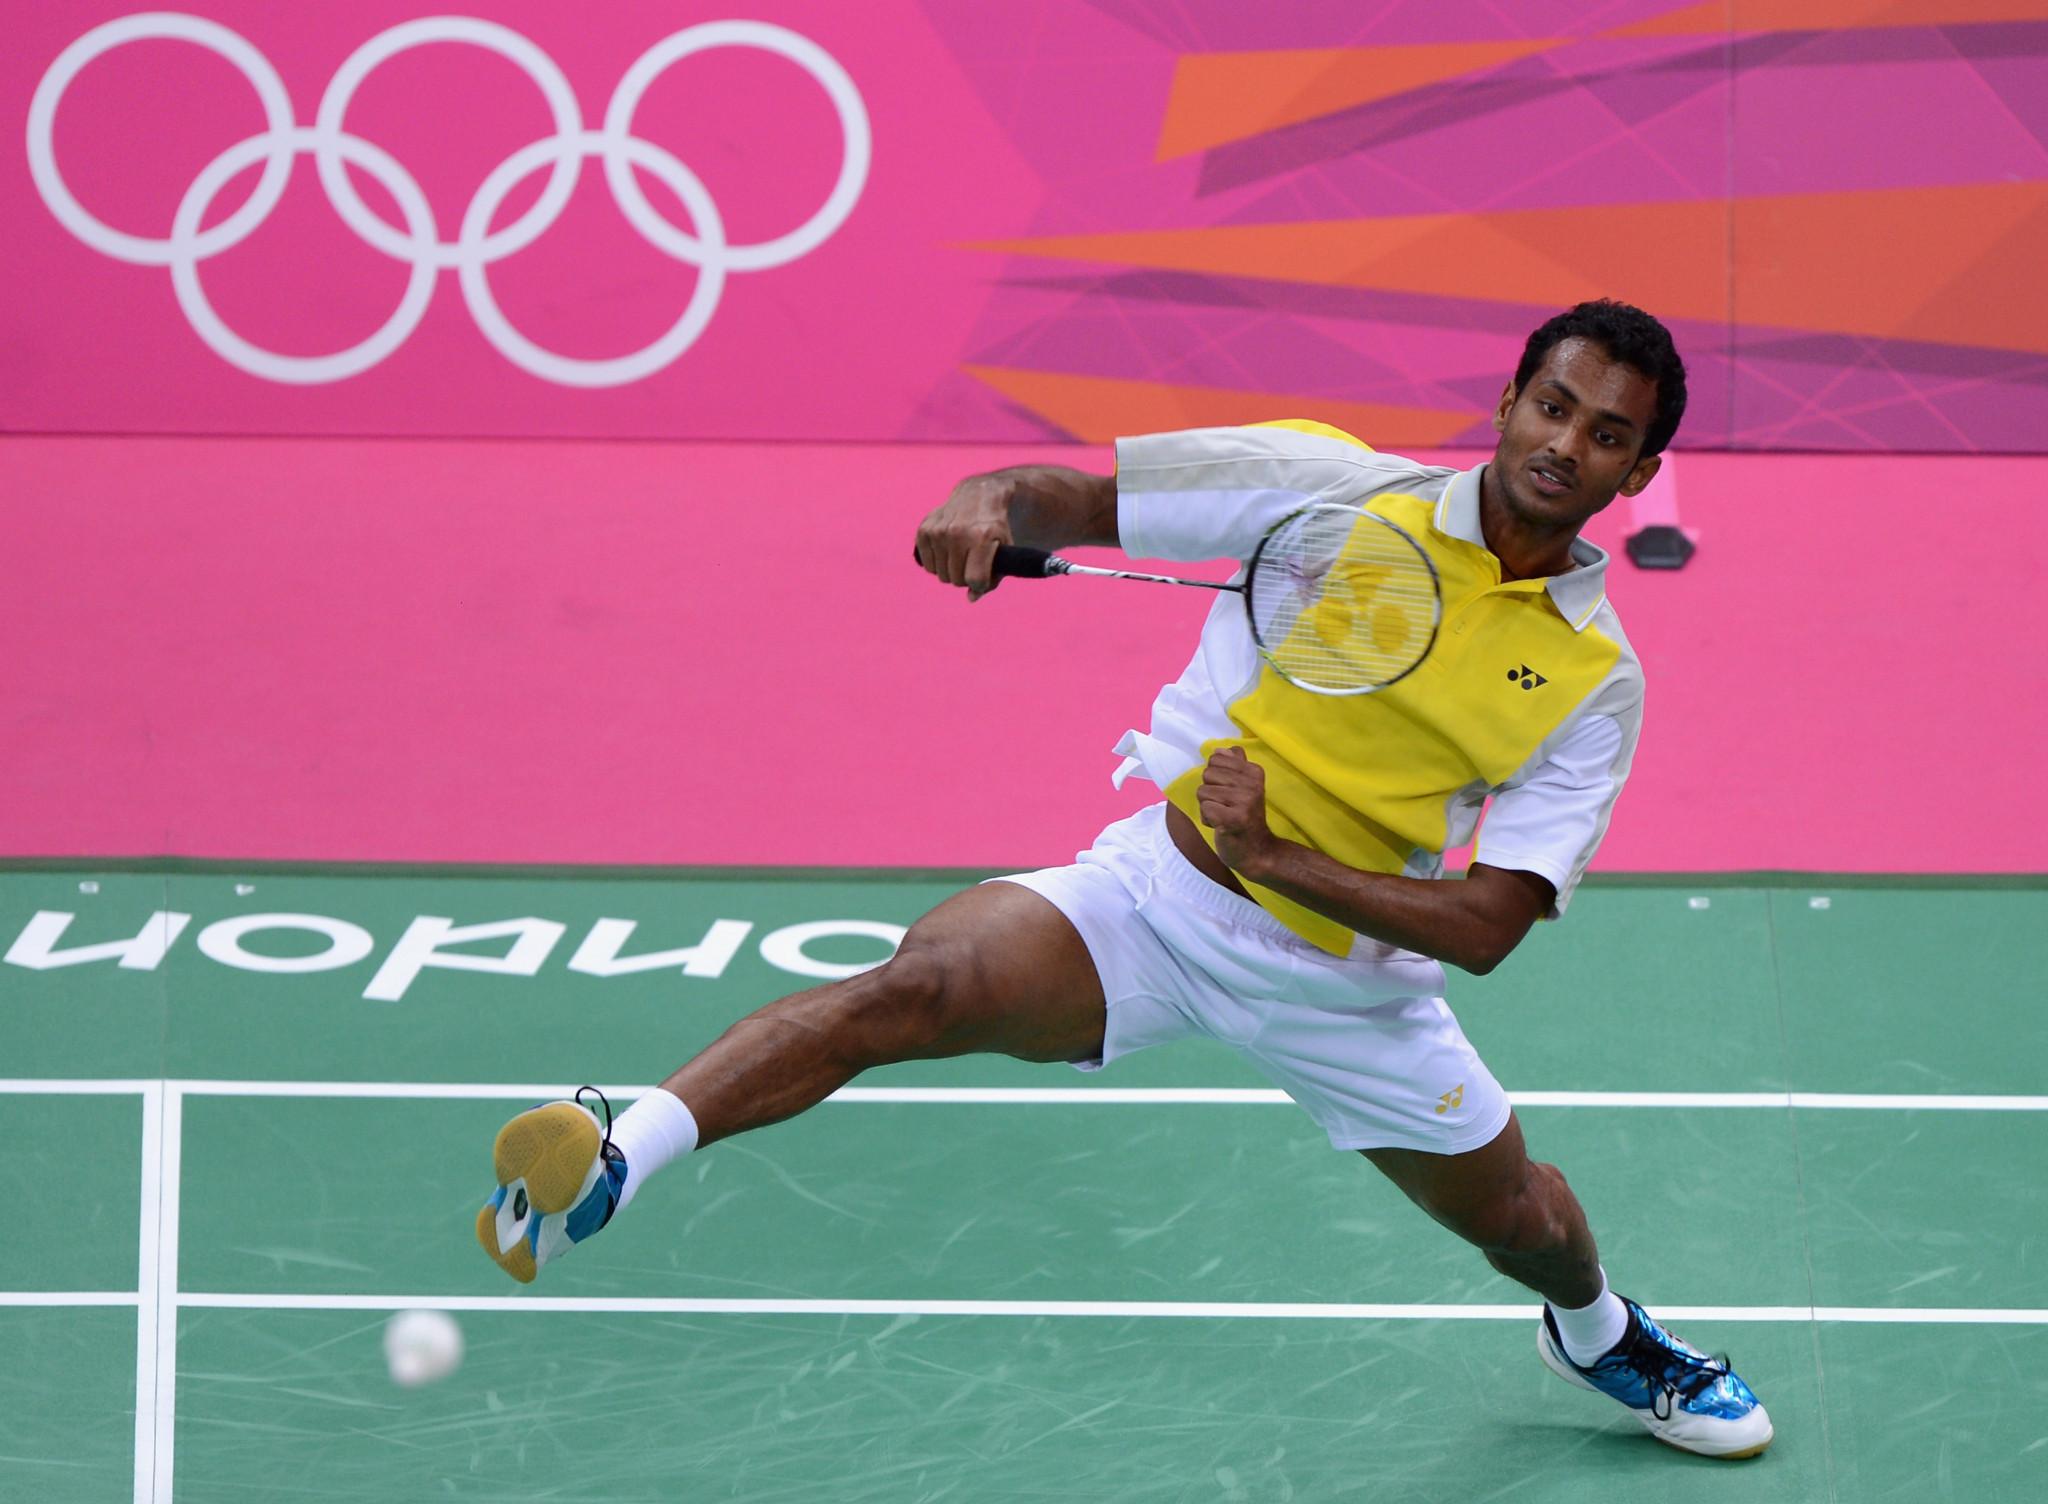 Badminton player Karunaratne set for third Olympics as Sri Lanka confirms Tokyo 2020 team